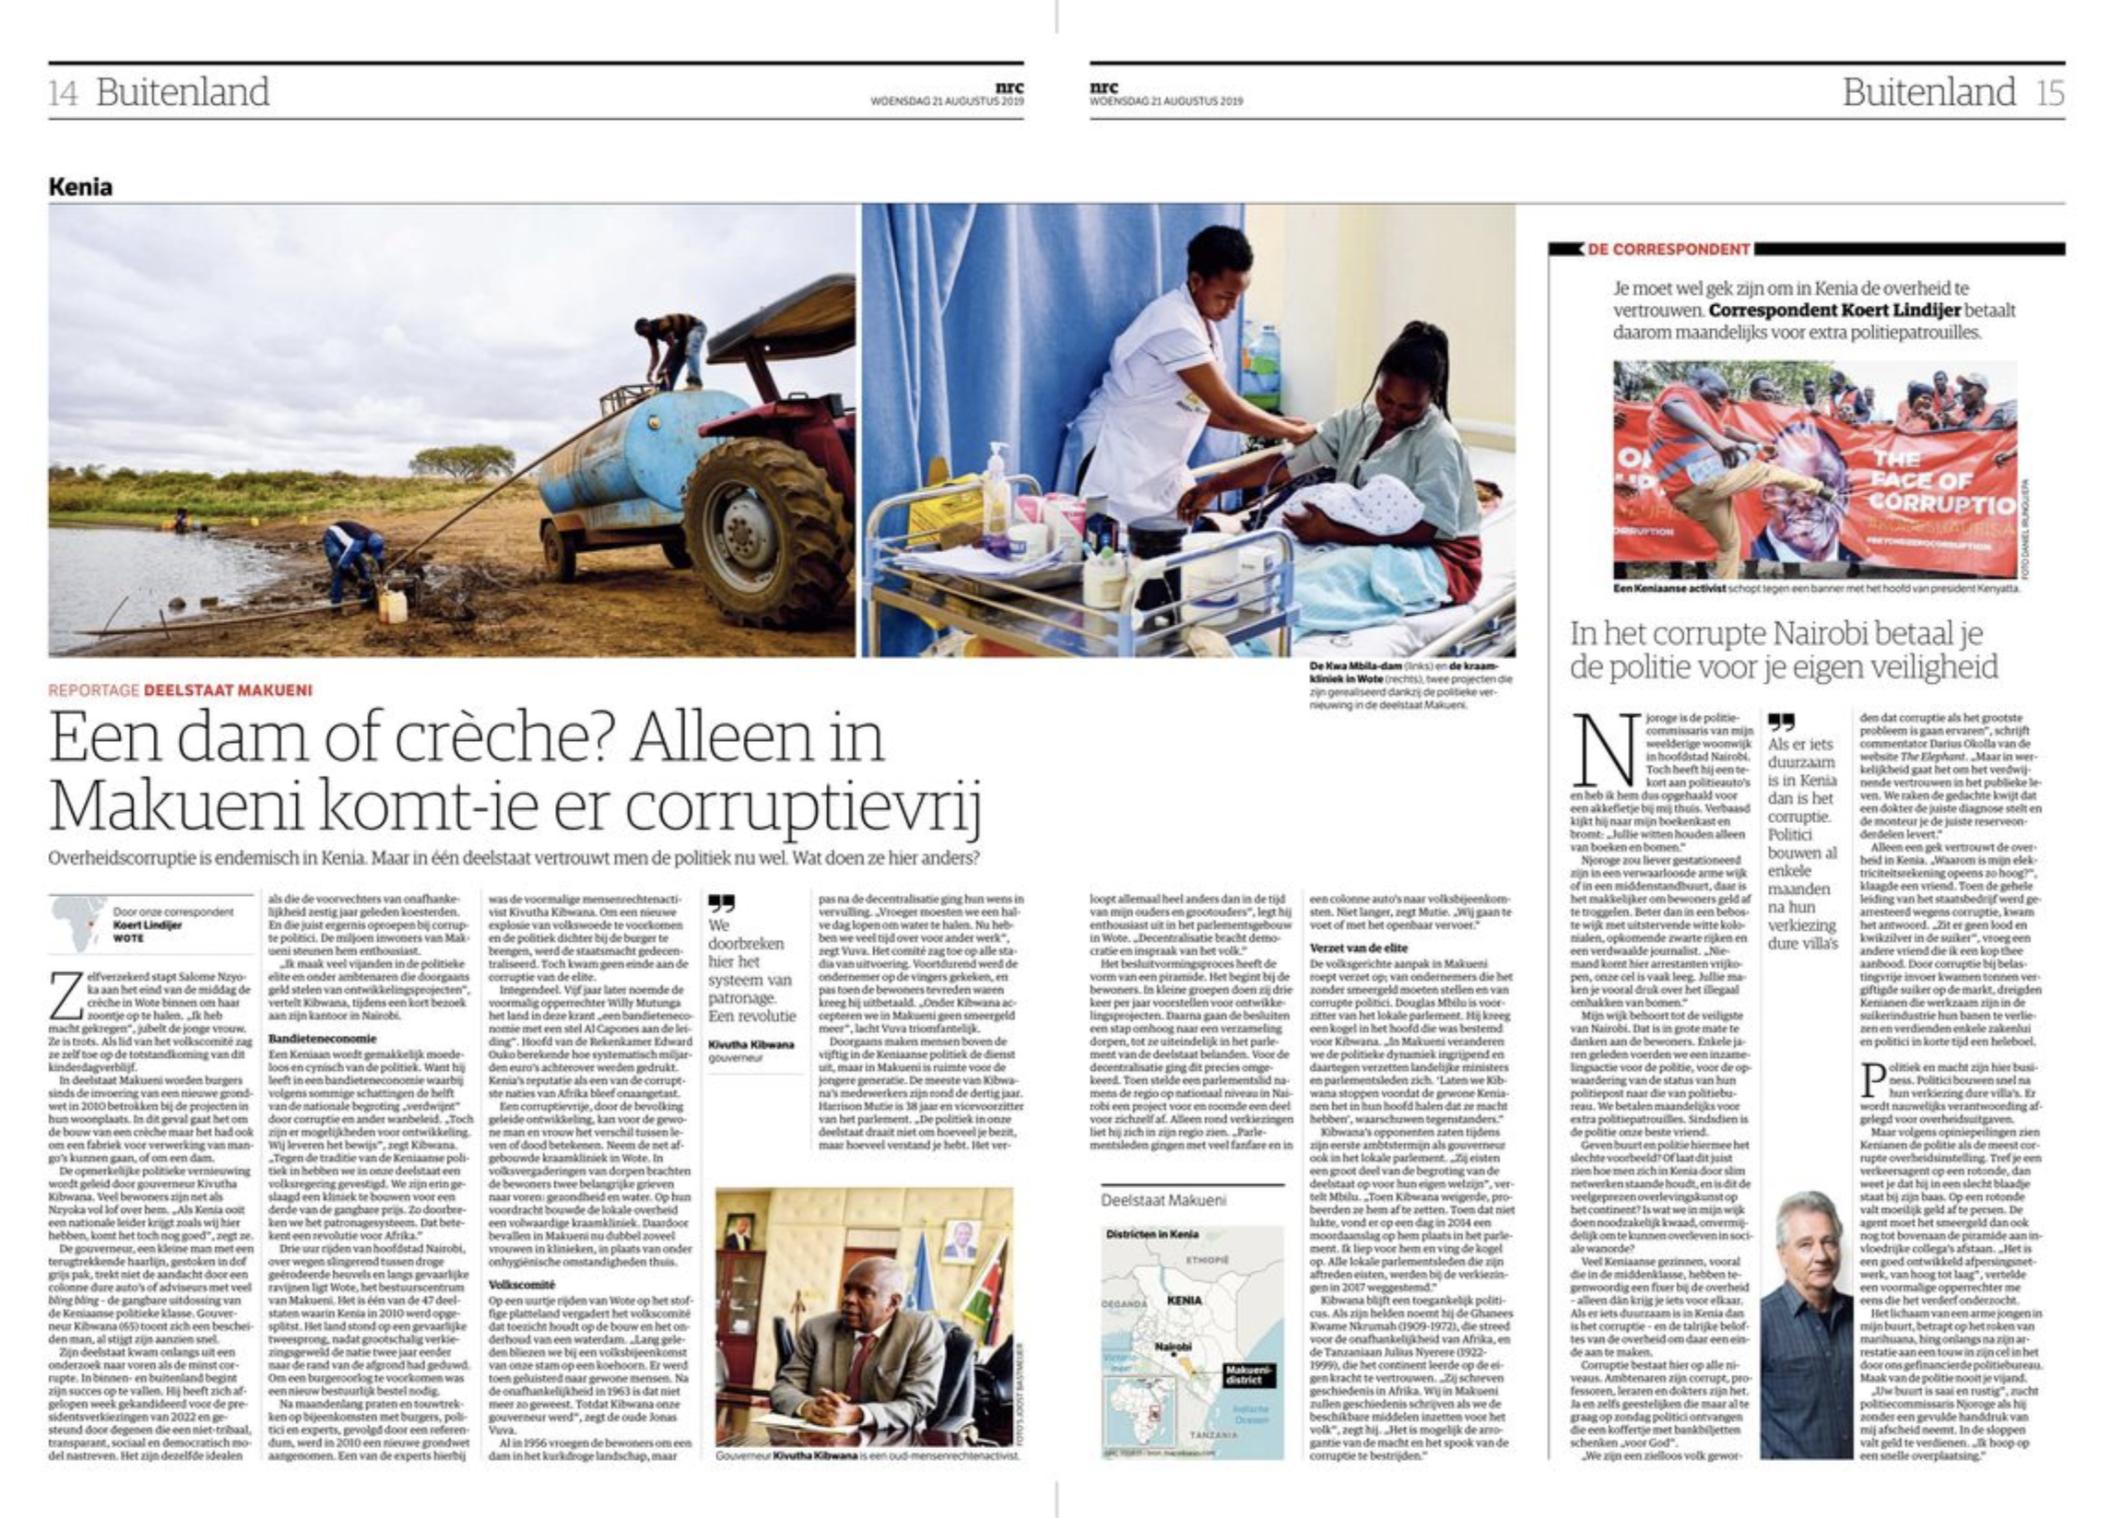 Kibwana Makueni County NRC Handelsblad Joost Bastmeijer